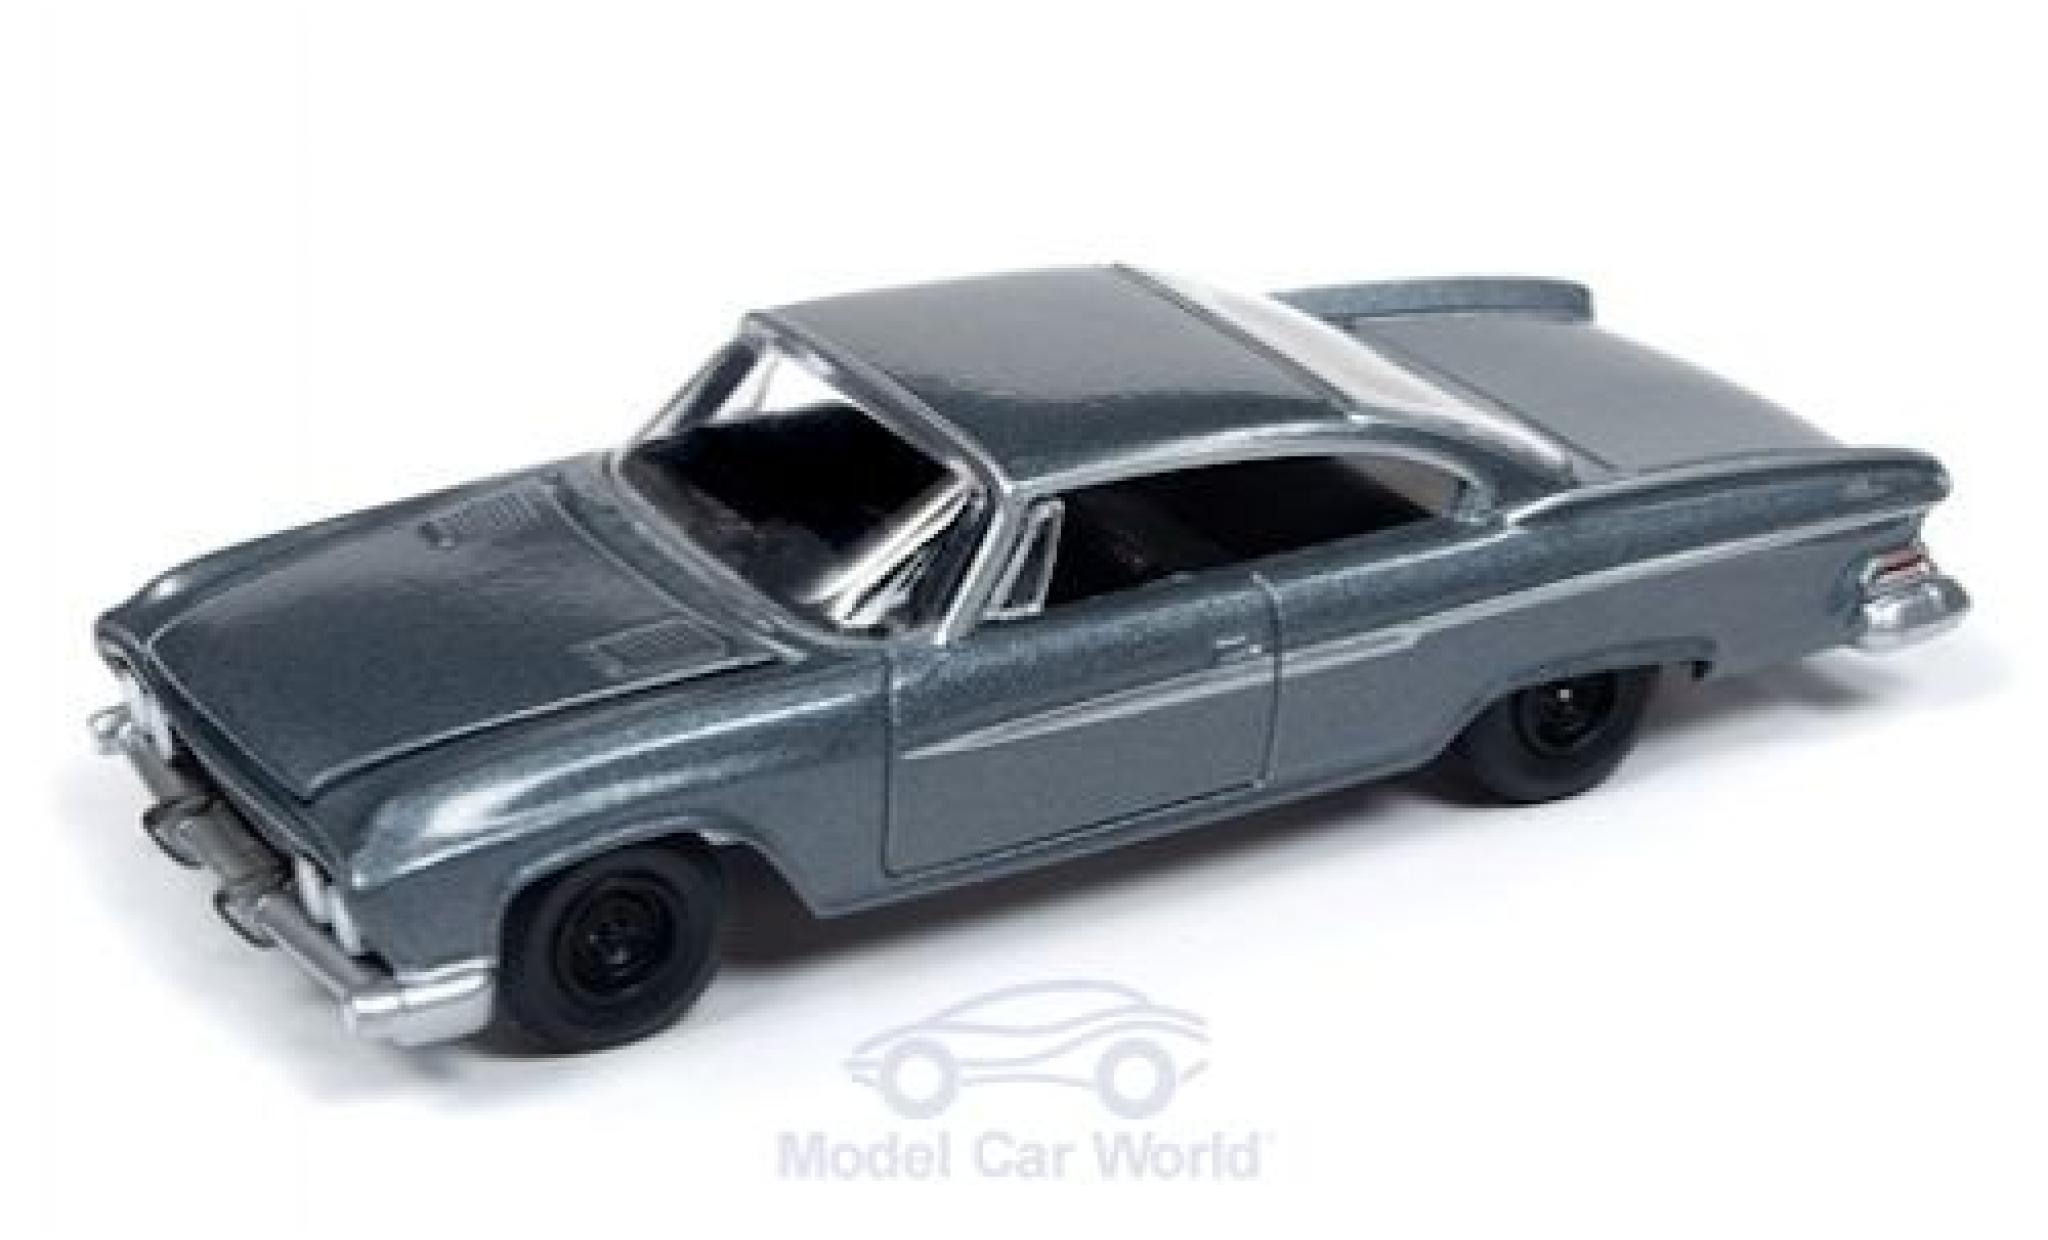 Diecast Model Cars Dodge Dart 1 64 Auto World Phoenix Metallise Grey 1961 Premium Series Release 3 Version B Alldiecast Co Uk